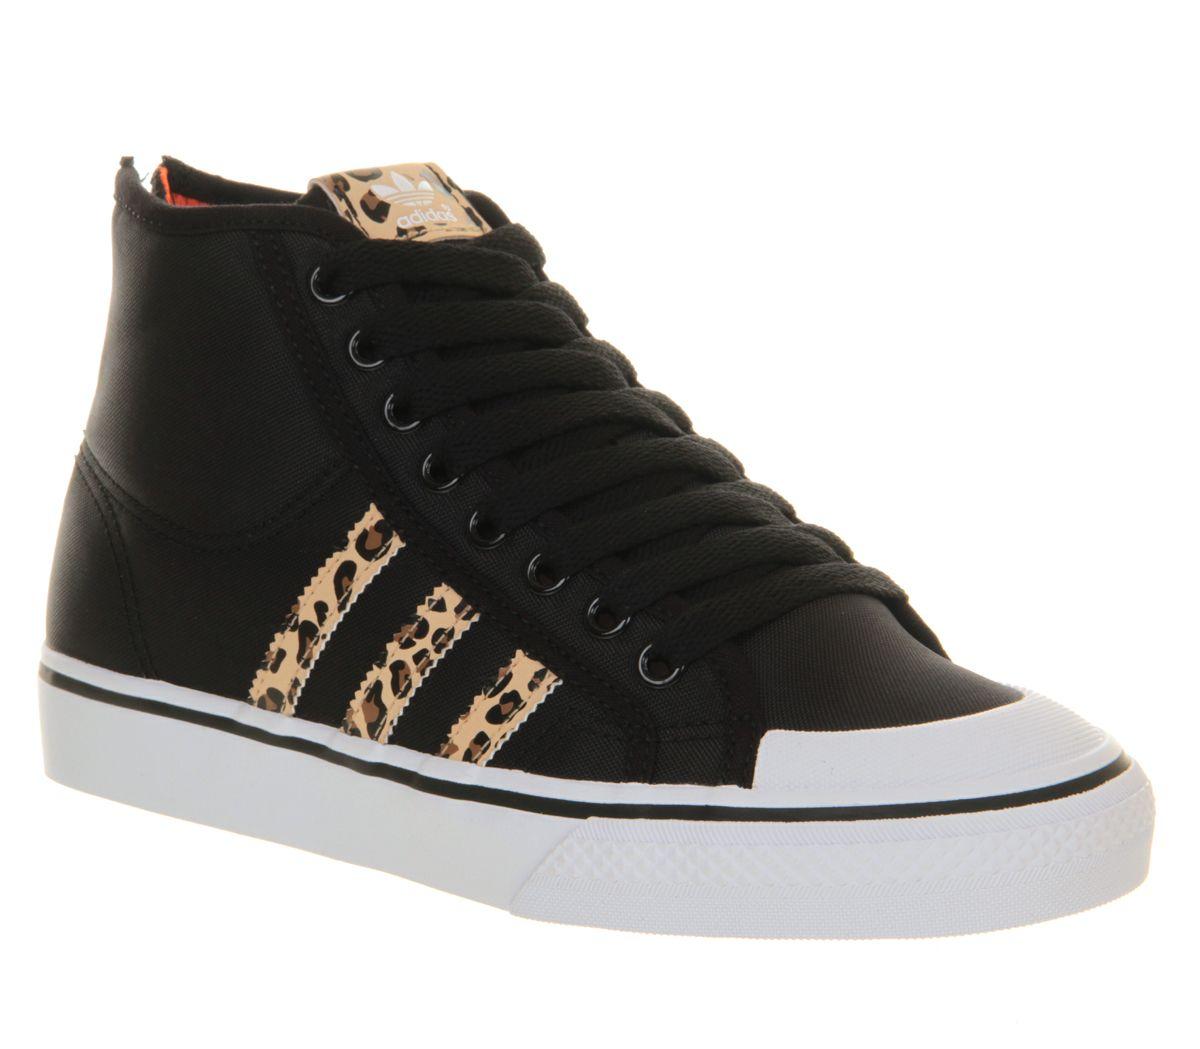 Mens Adidas Nizza Hi Heel Zip Black Orange Leopard Exclusive Trainers Shoes,  Black, http